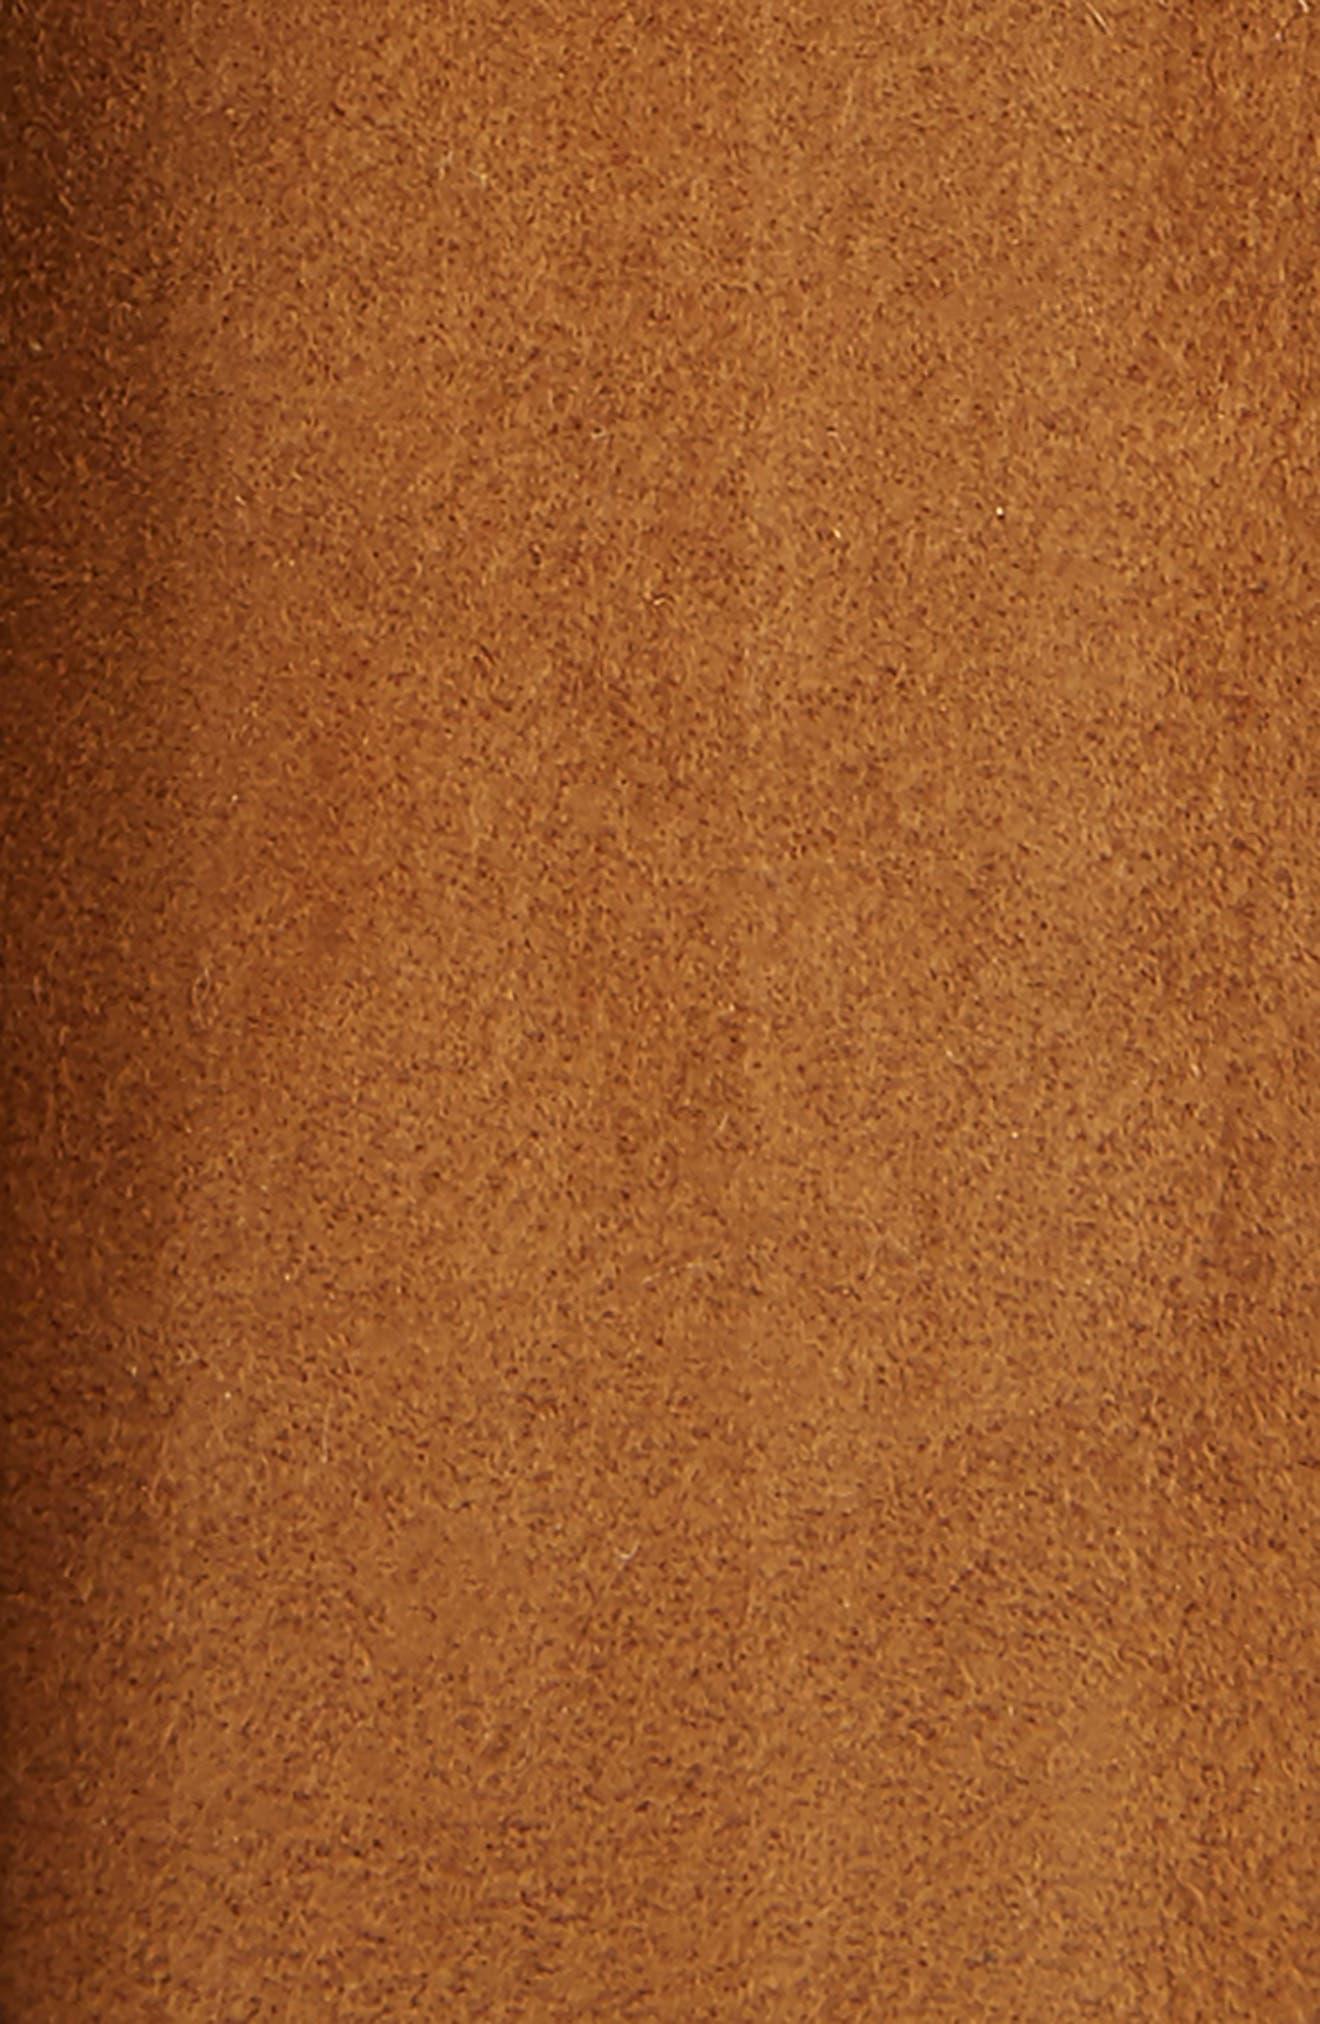 Ante Cabra Leather Belt,                             Alternate thumbnail 2, color,                             202